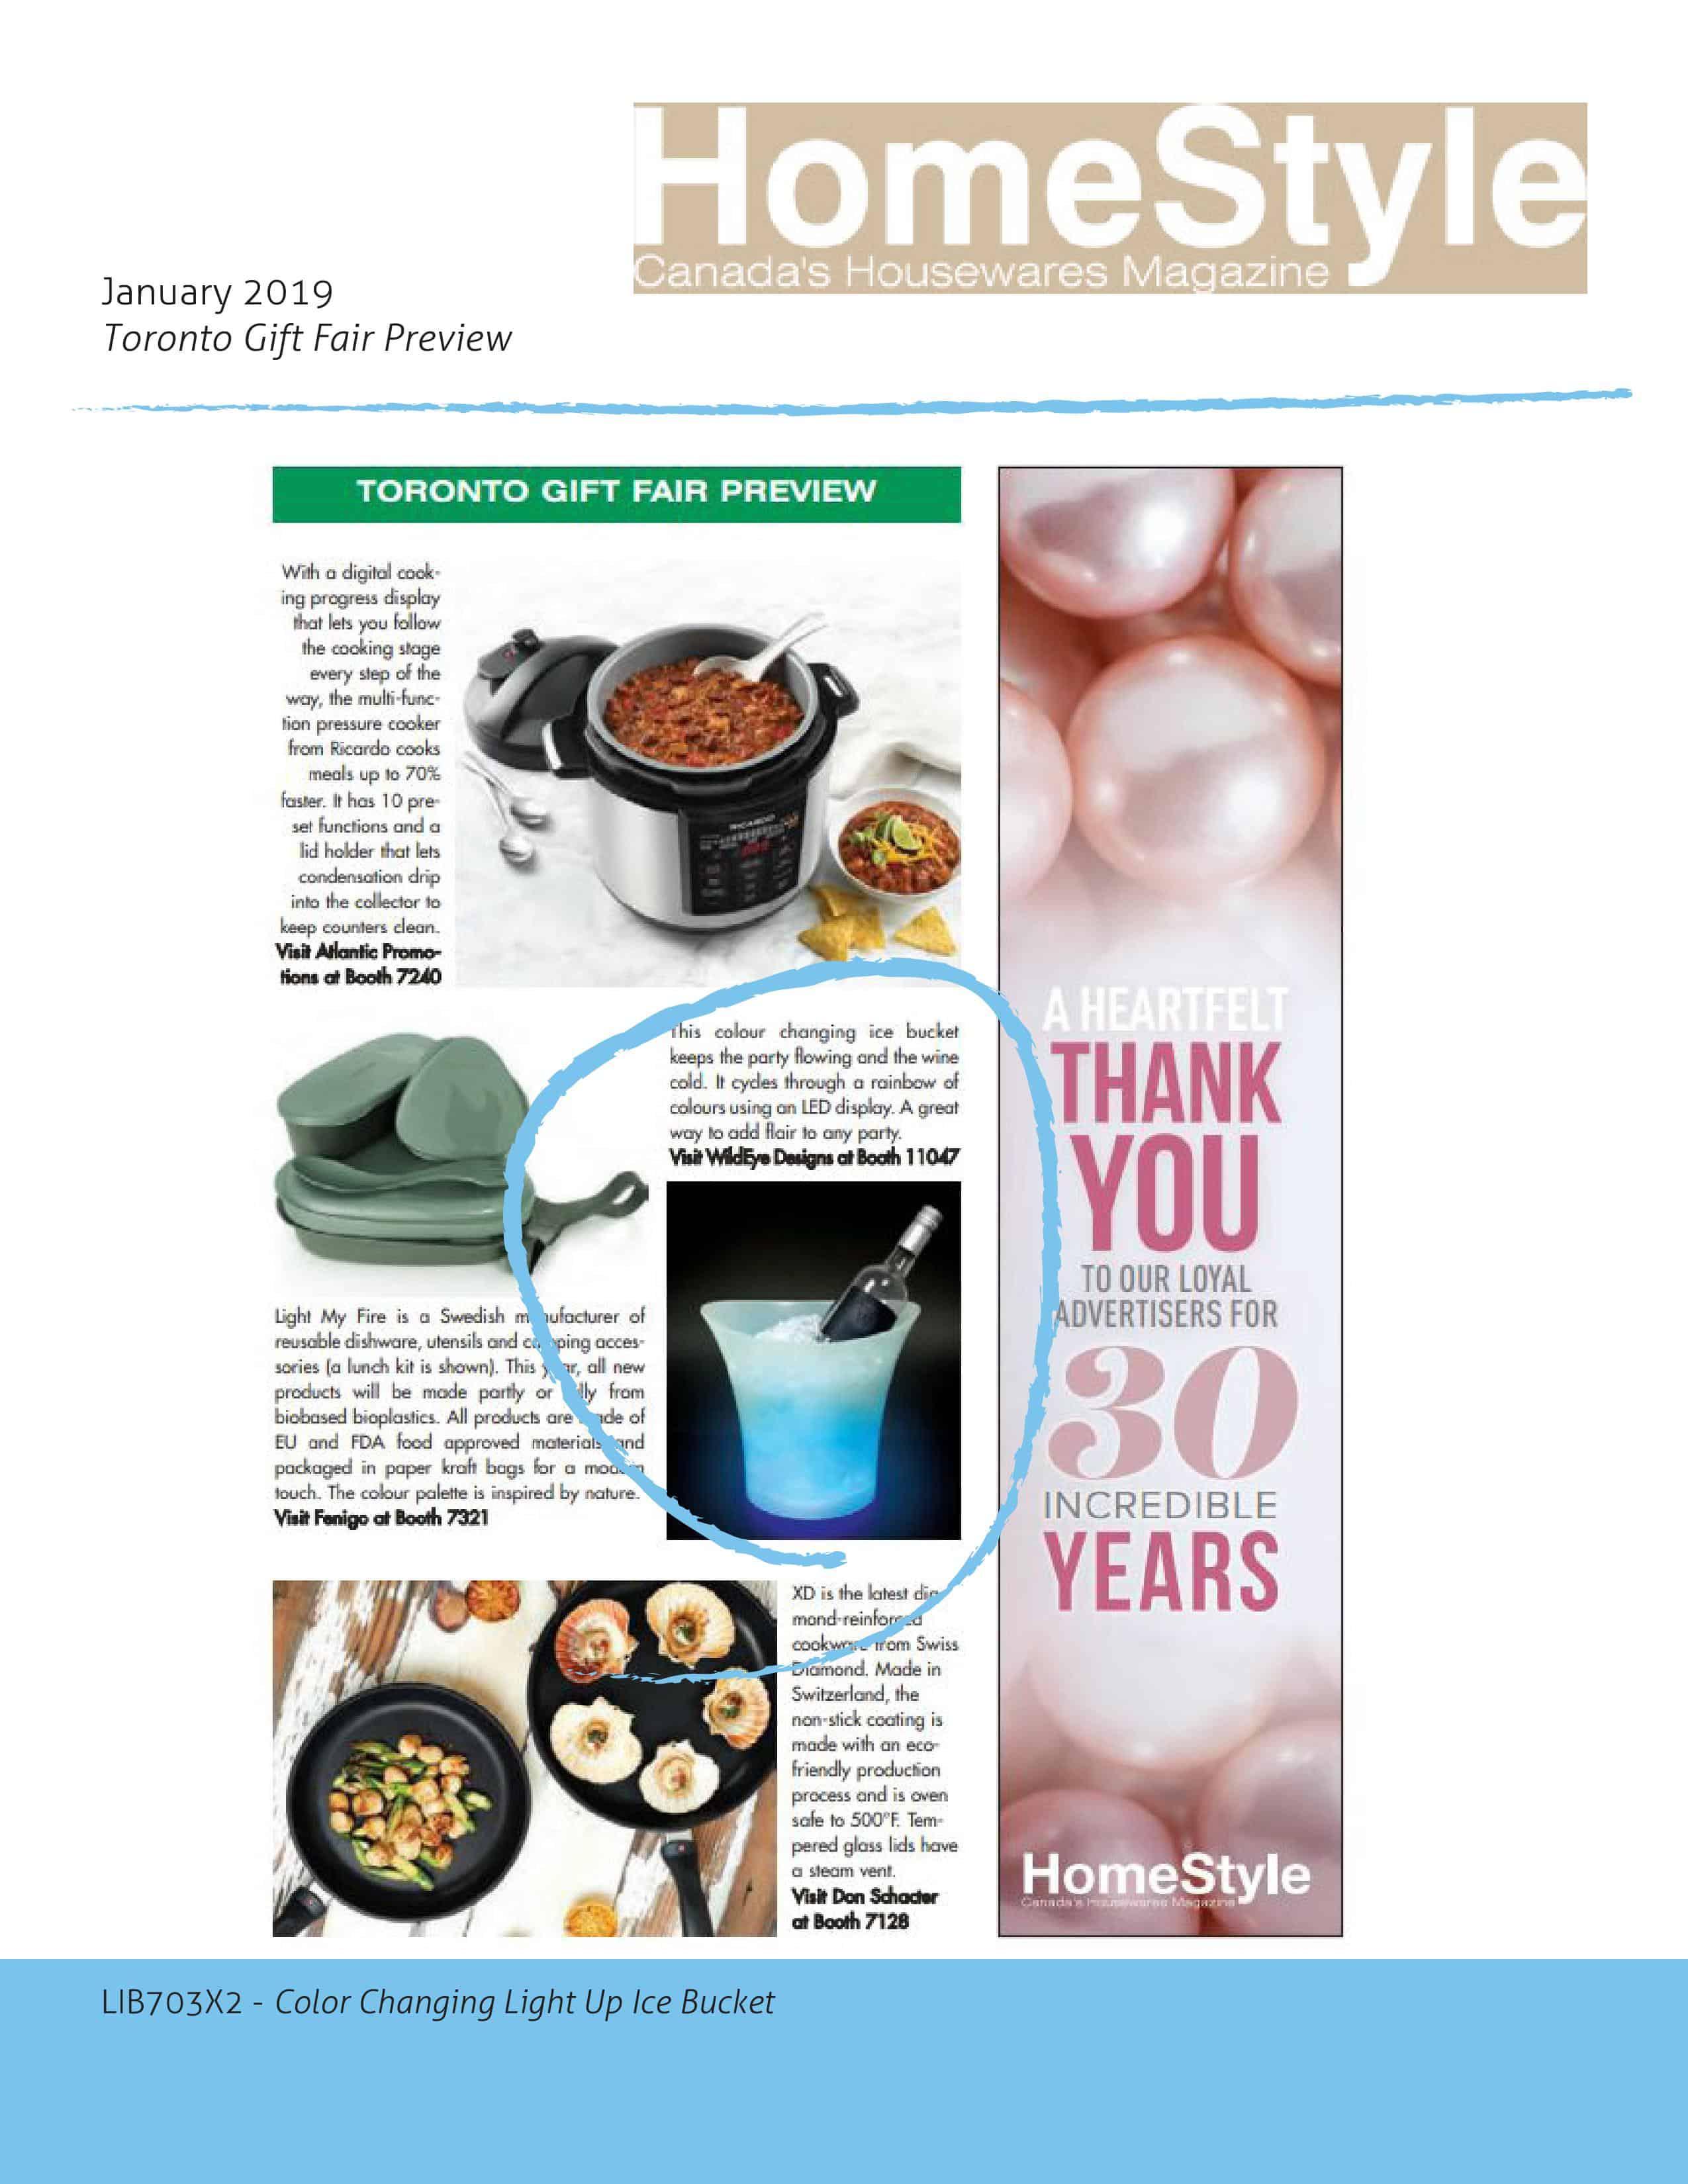 HomeStyle Canada's Housewares Magazine January 2019 Issue